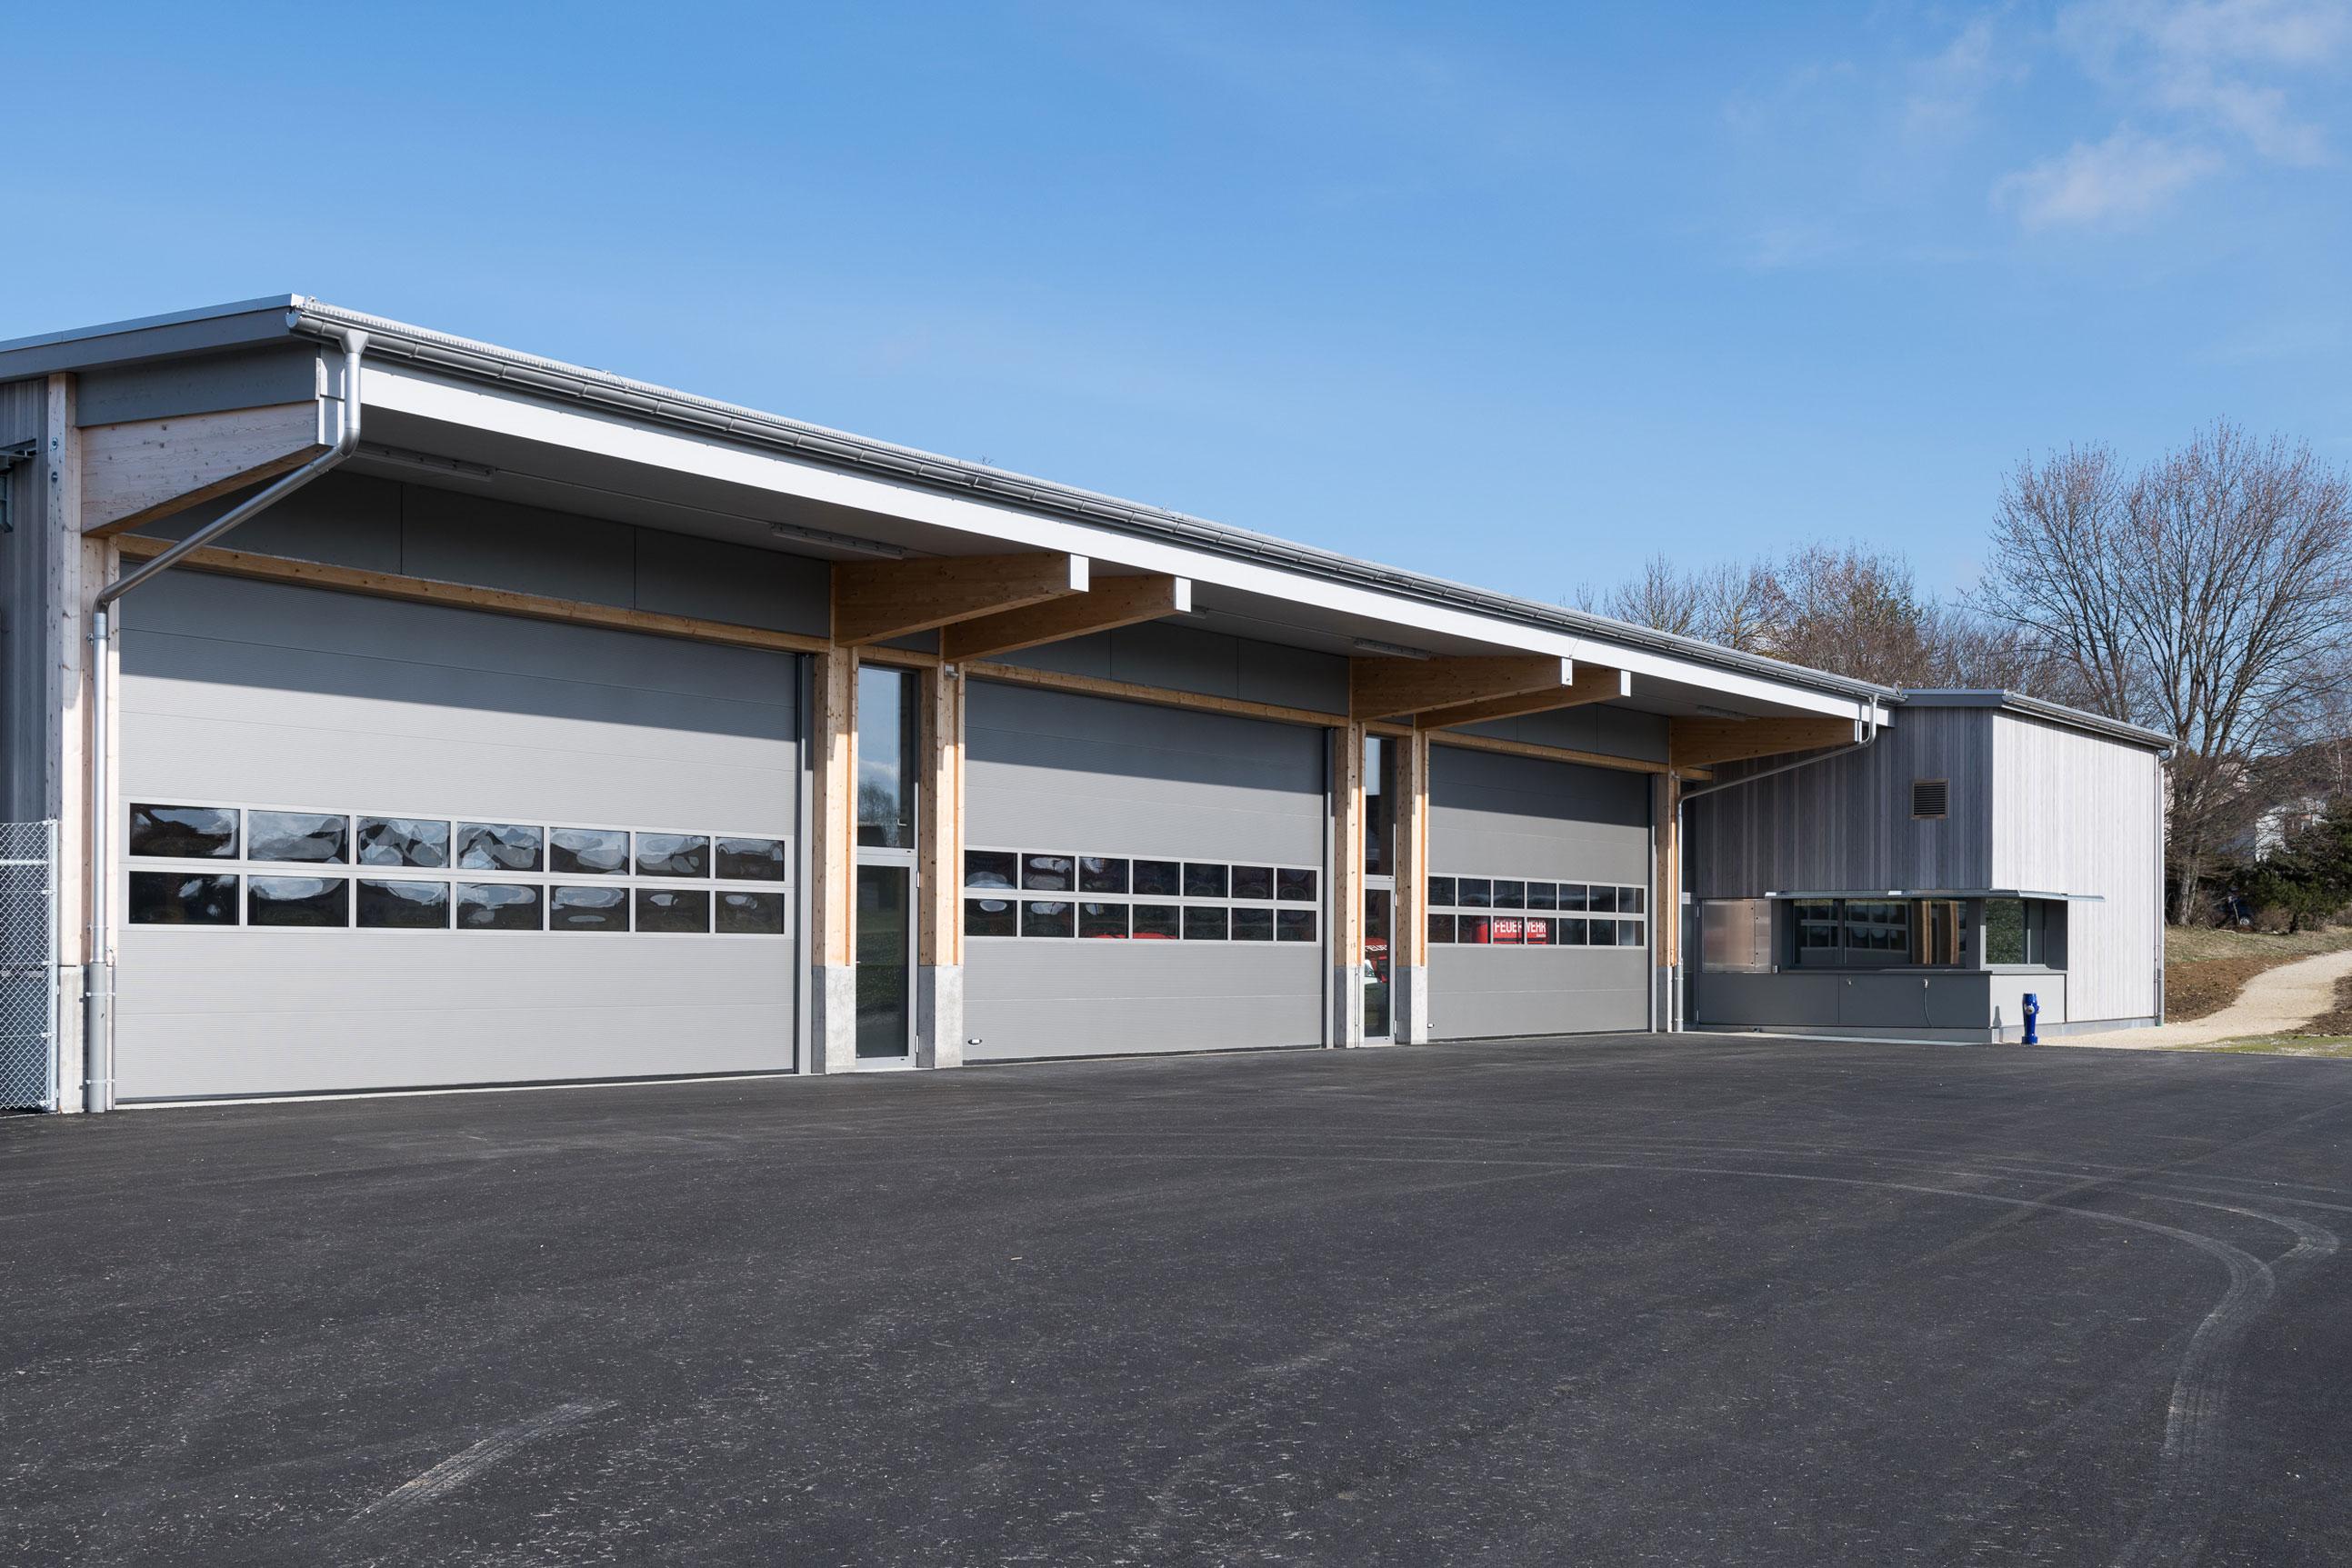 Minergie Feuerwehrmagazin Lohn Holzbau 1